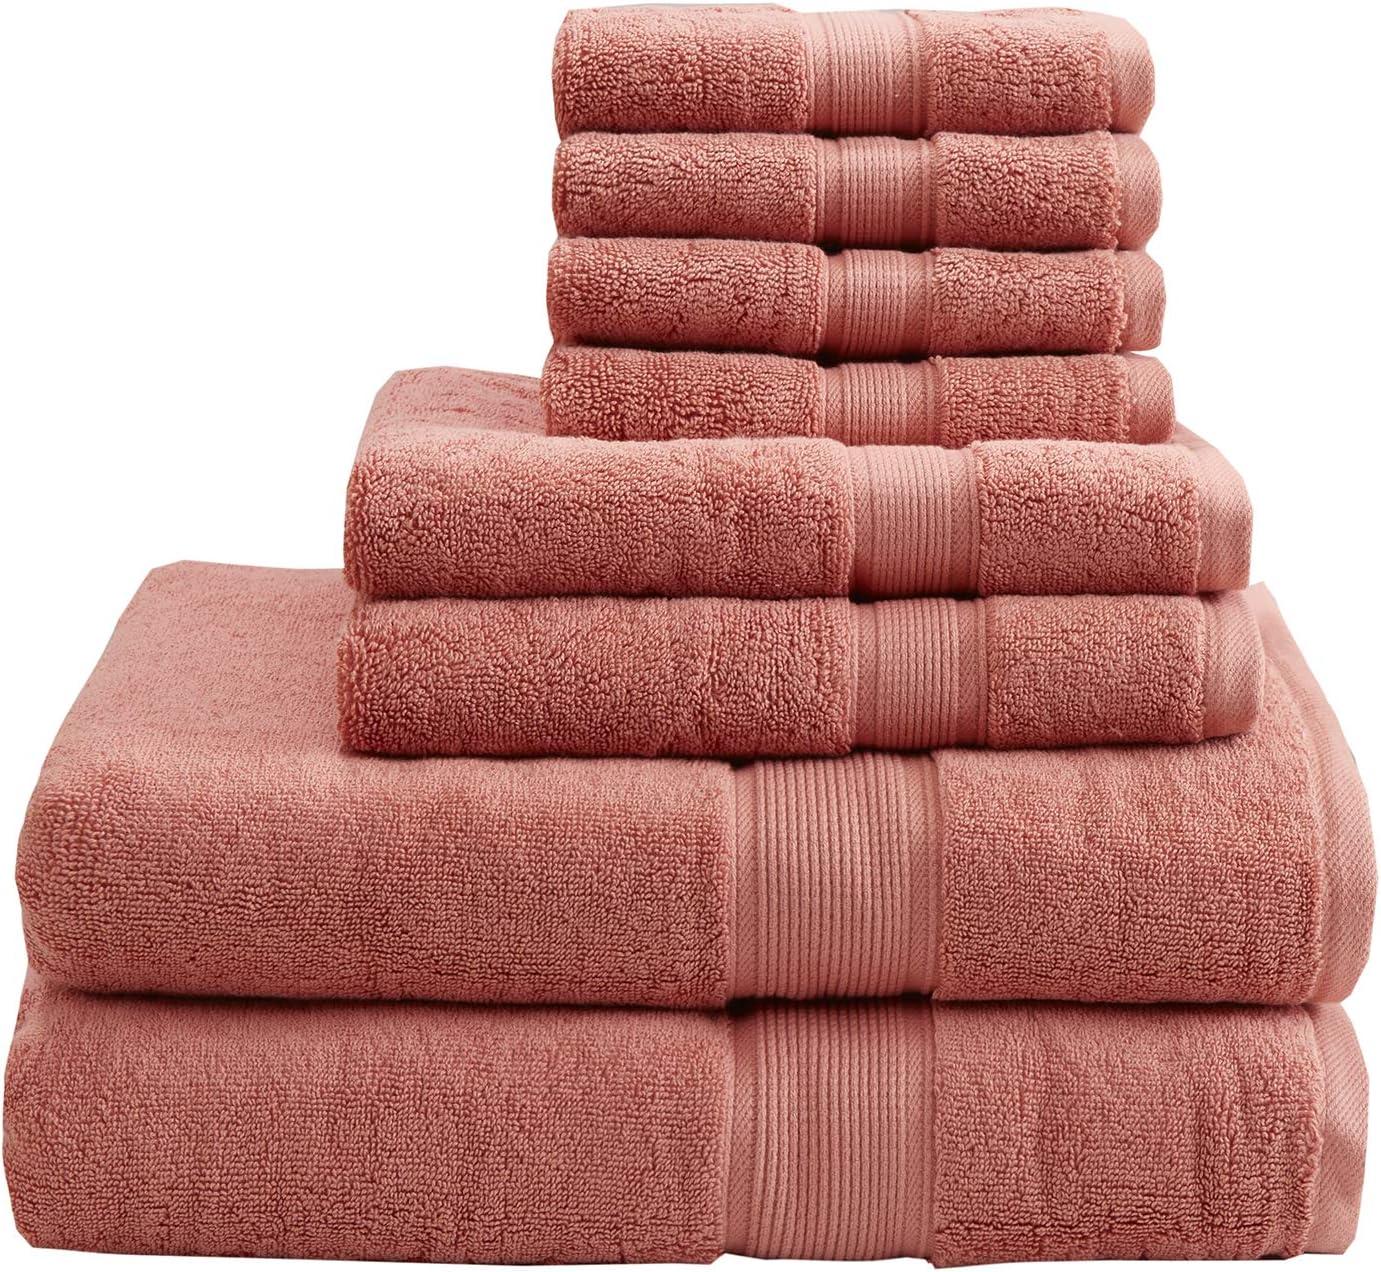 MADISON PARK SIGNATURE MPS73-195 800GSM 100% Cotton 8 Piece Towel Set Coral See Below